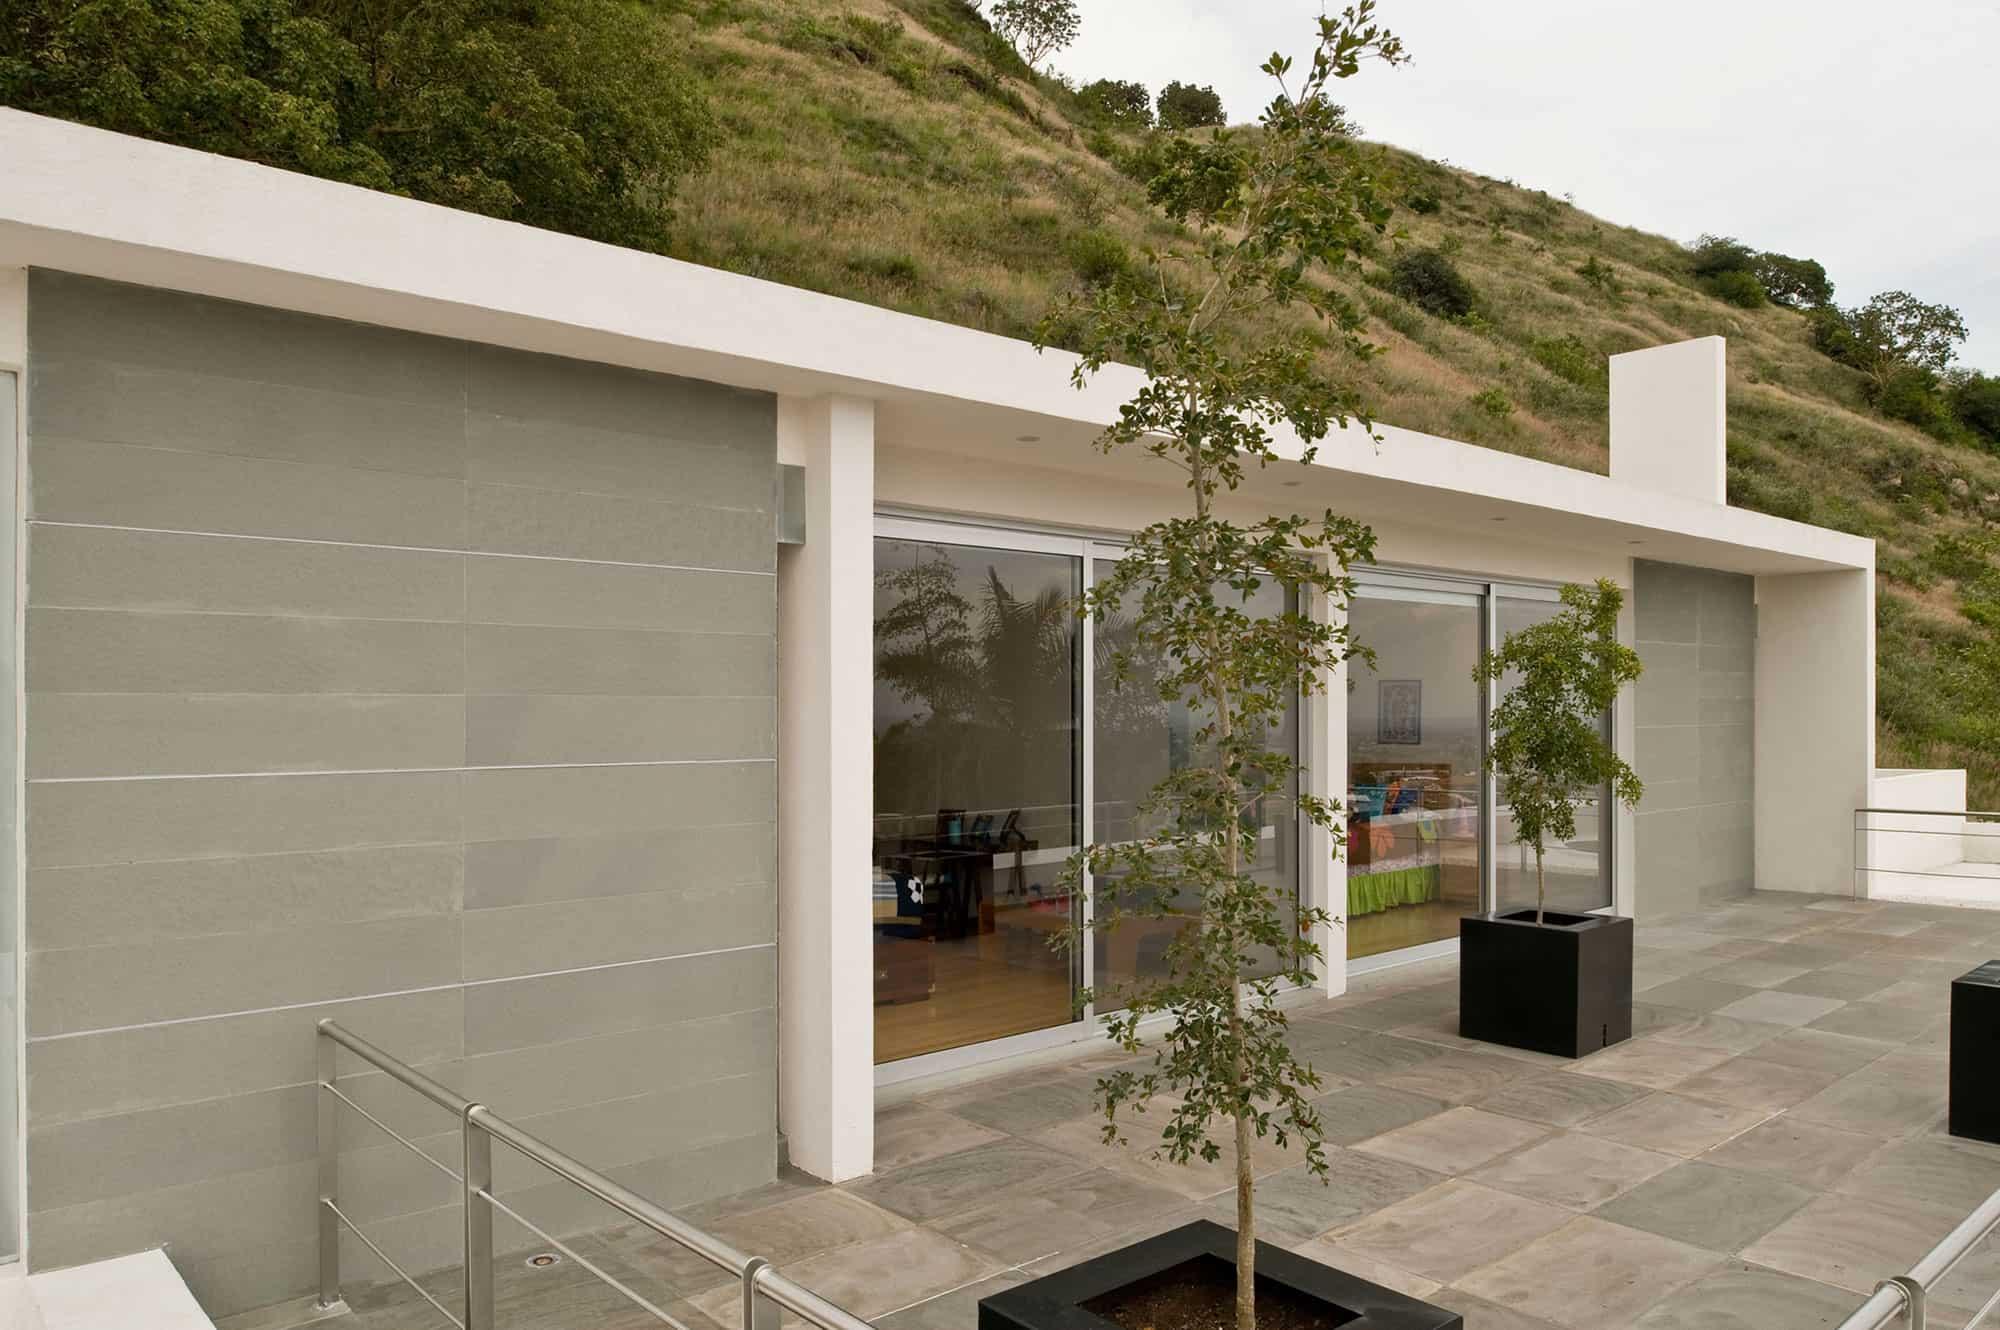 Mountain House by Agraz Arquitectos (3)